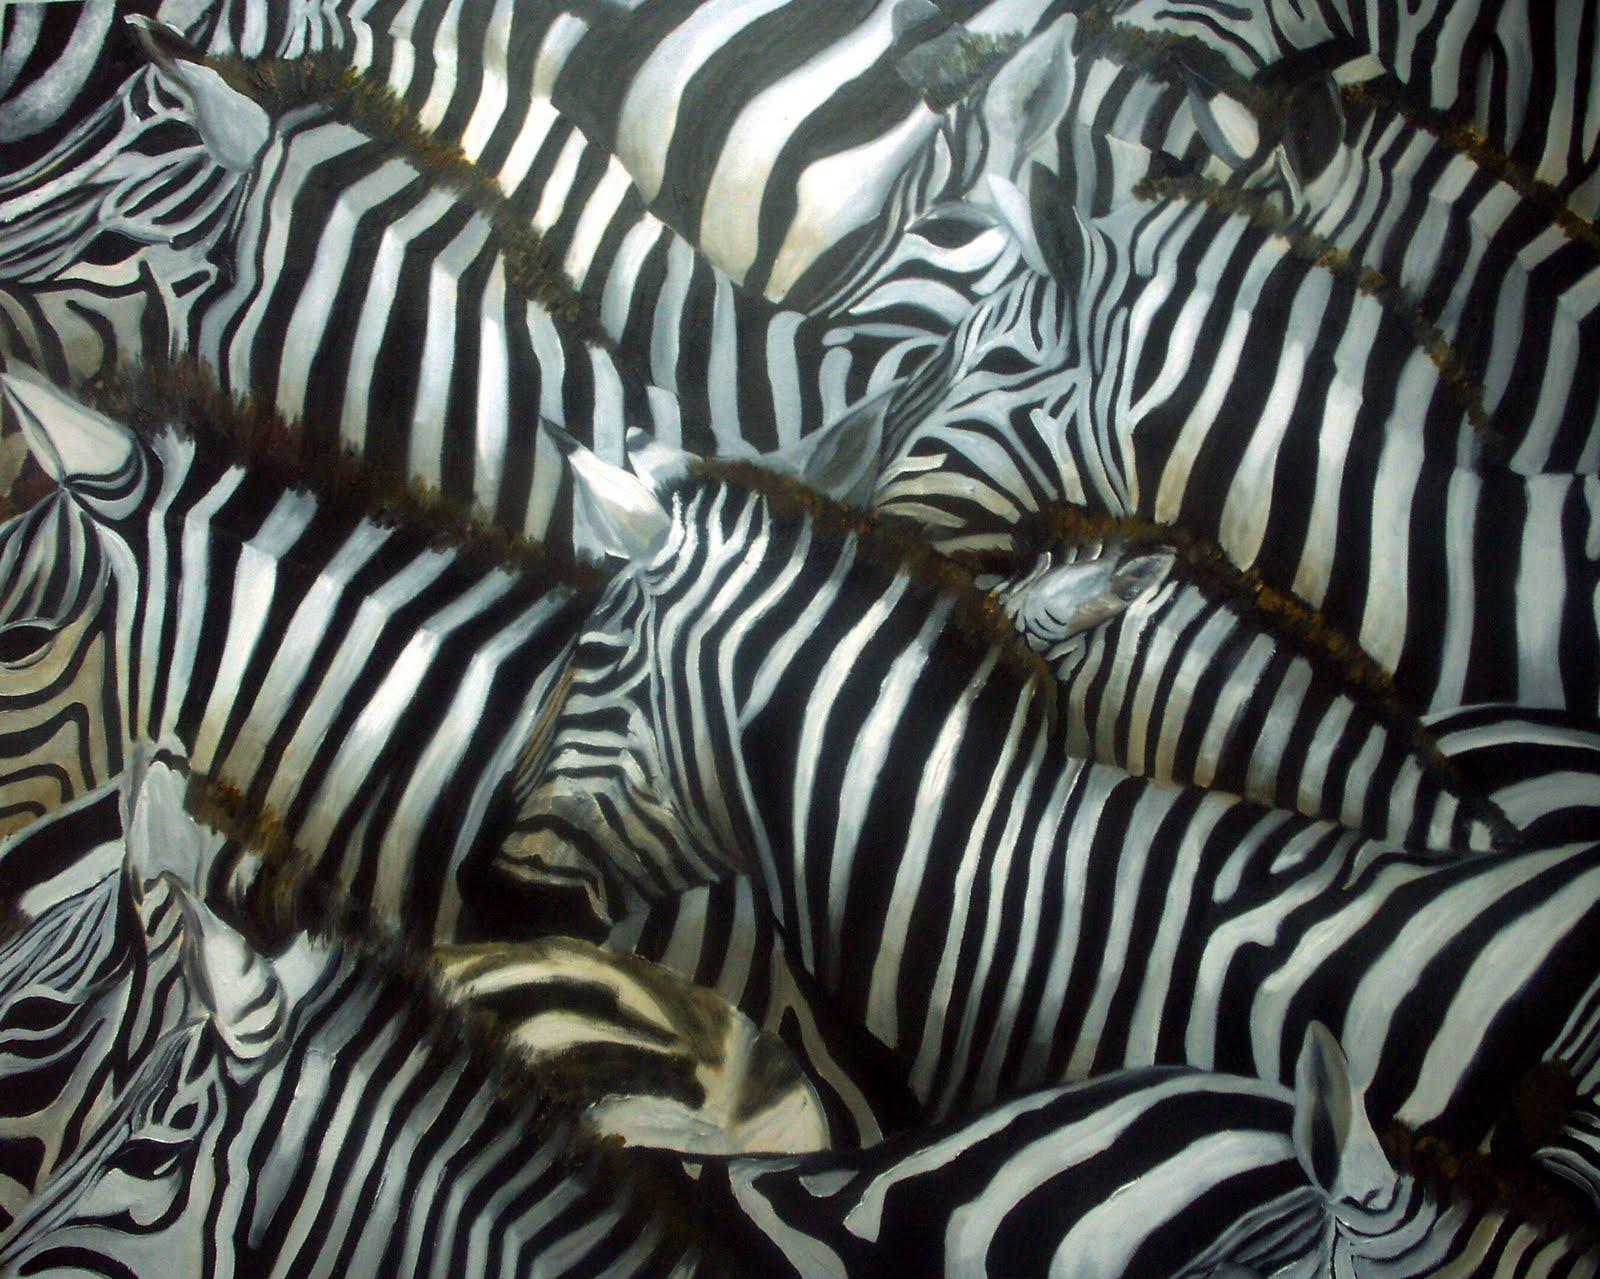 Manada cebras pinterest - Cuadros de cebras ...